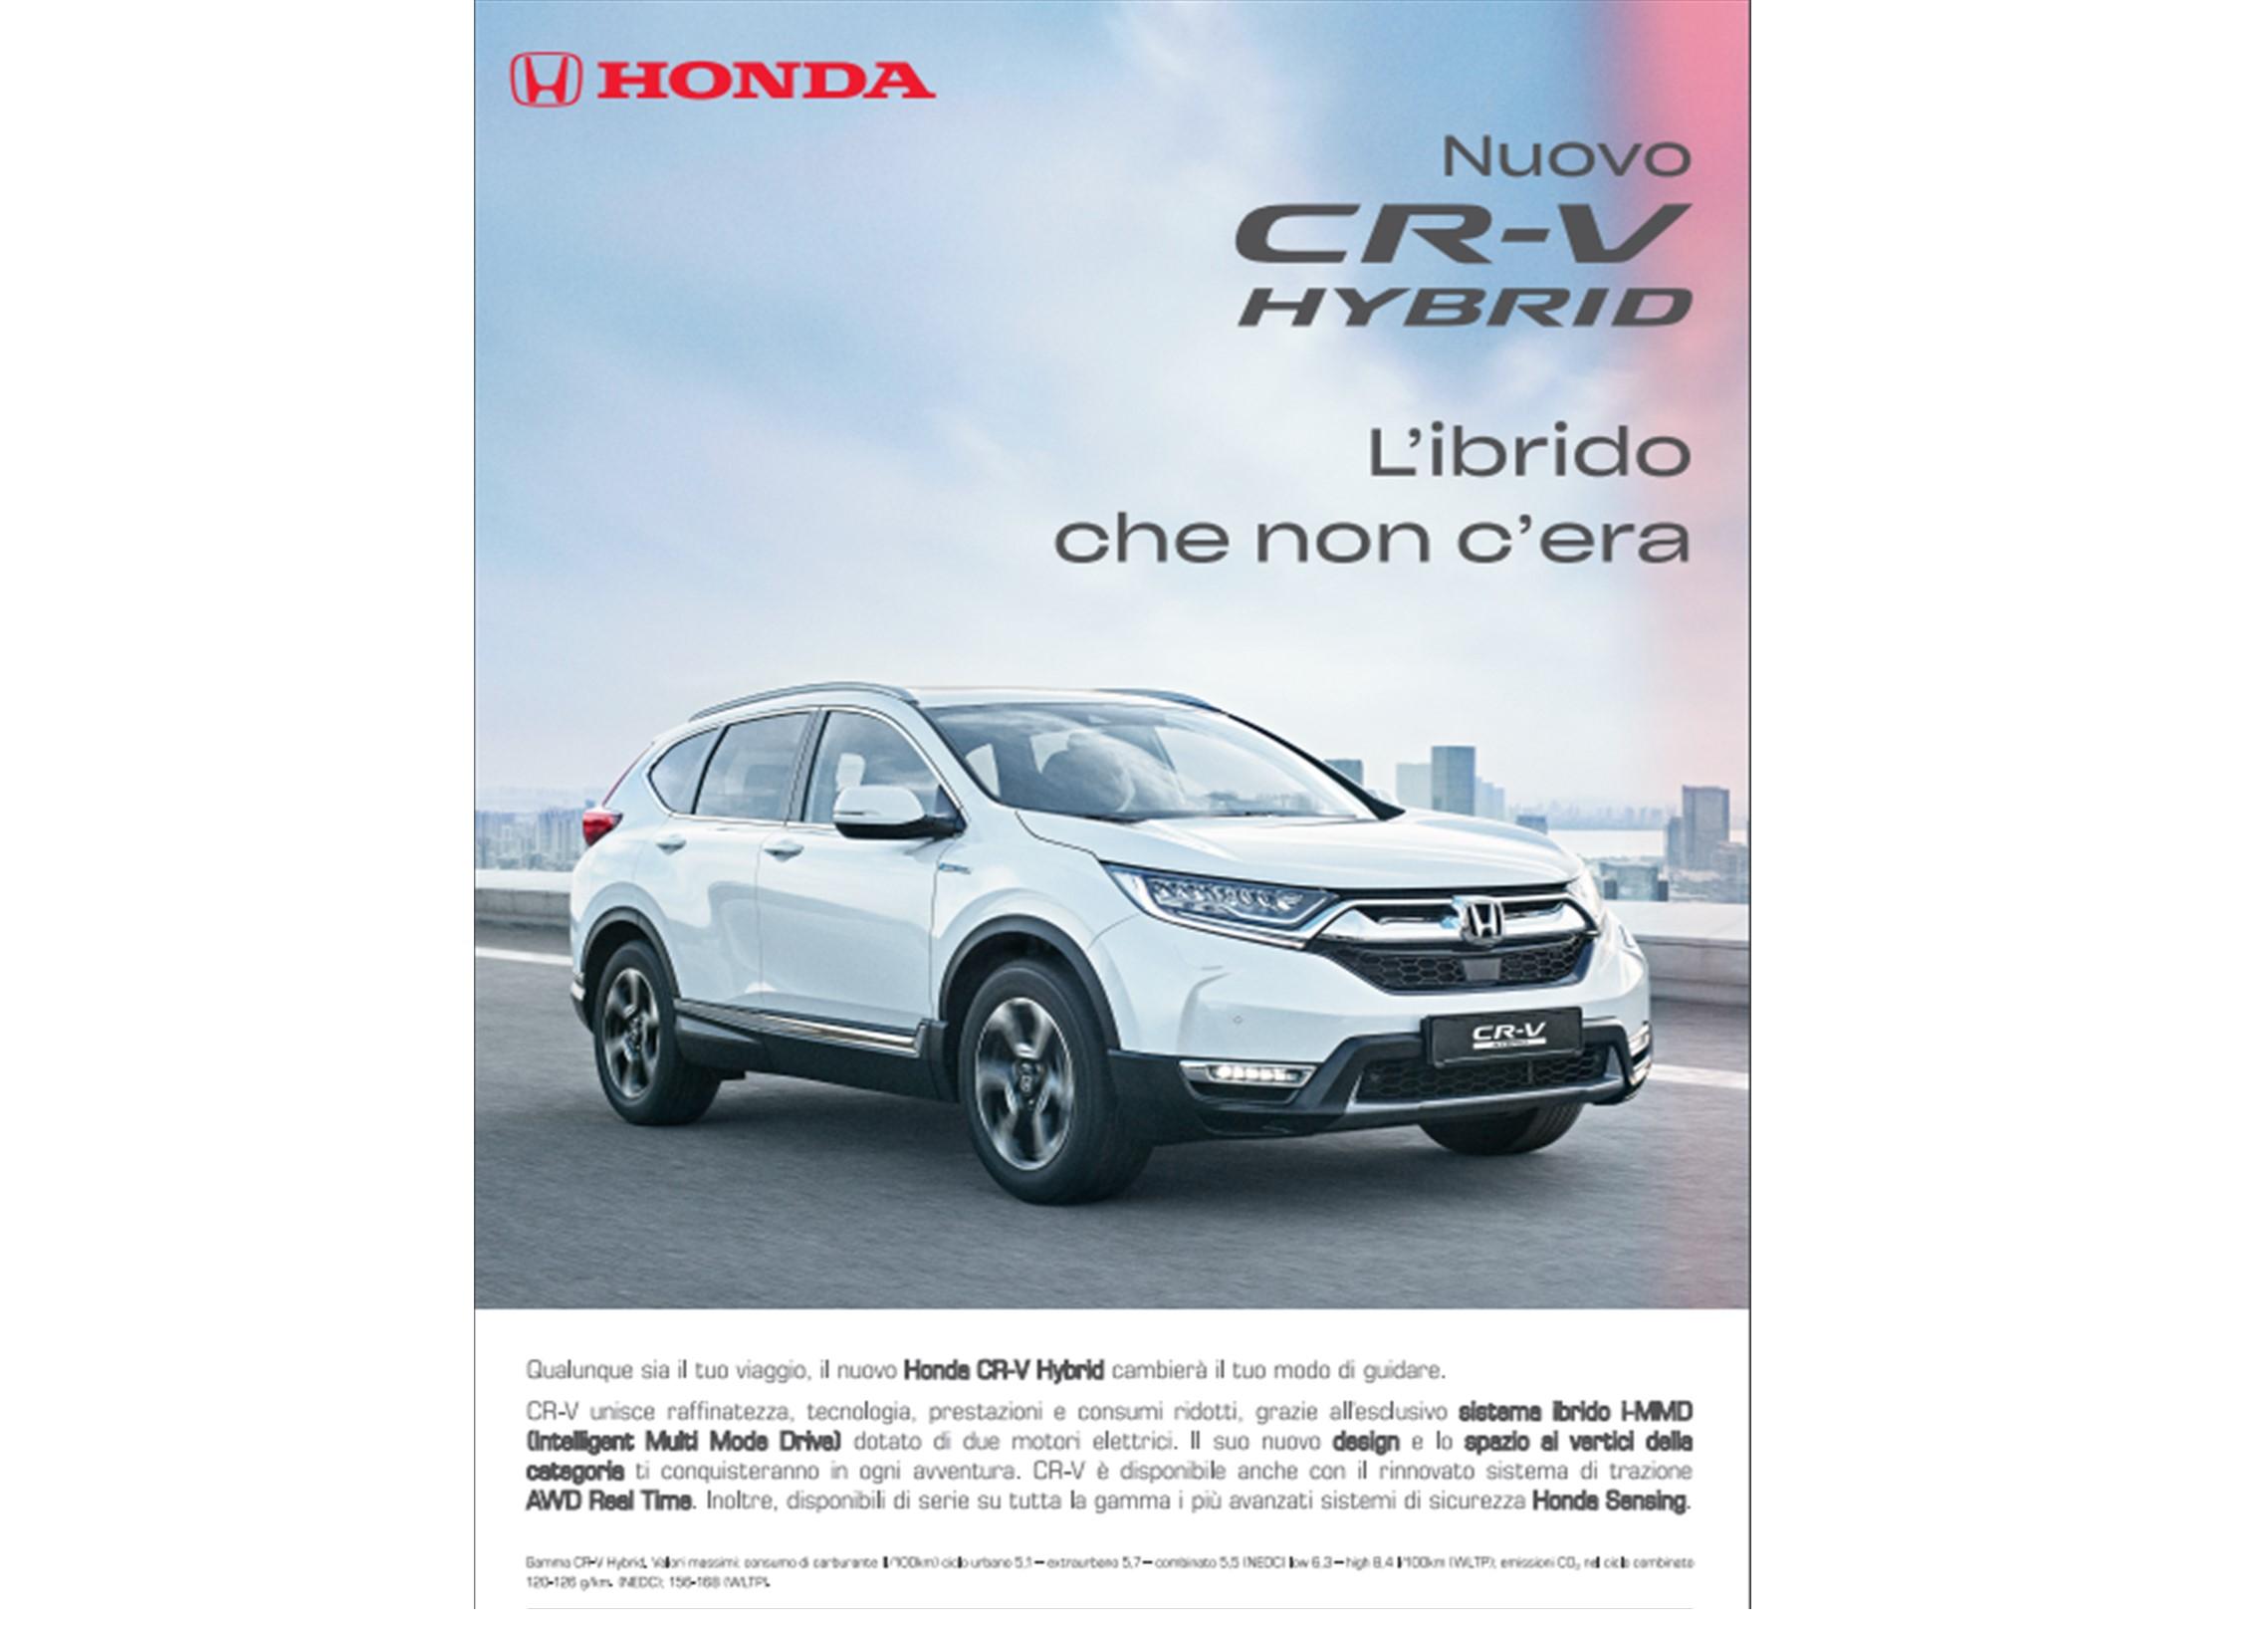 Scopri Nuovo Cr-v Hybrid